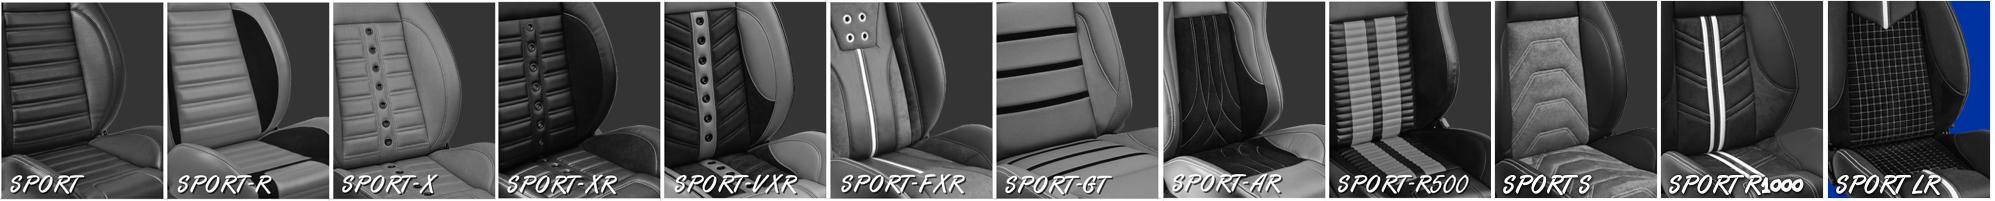 Sport R500 style